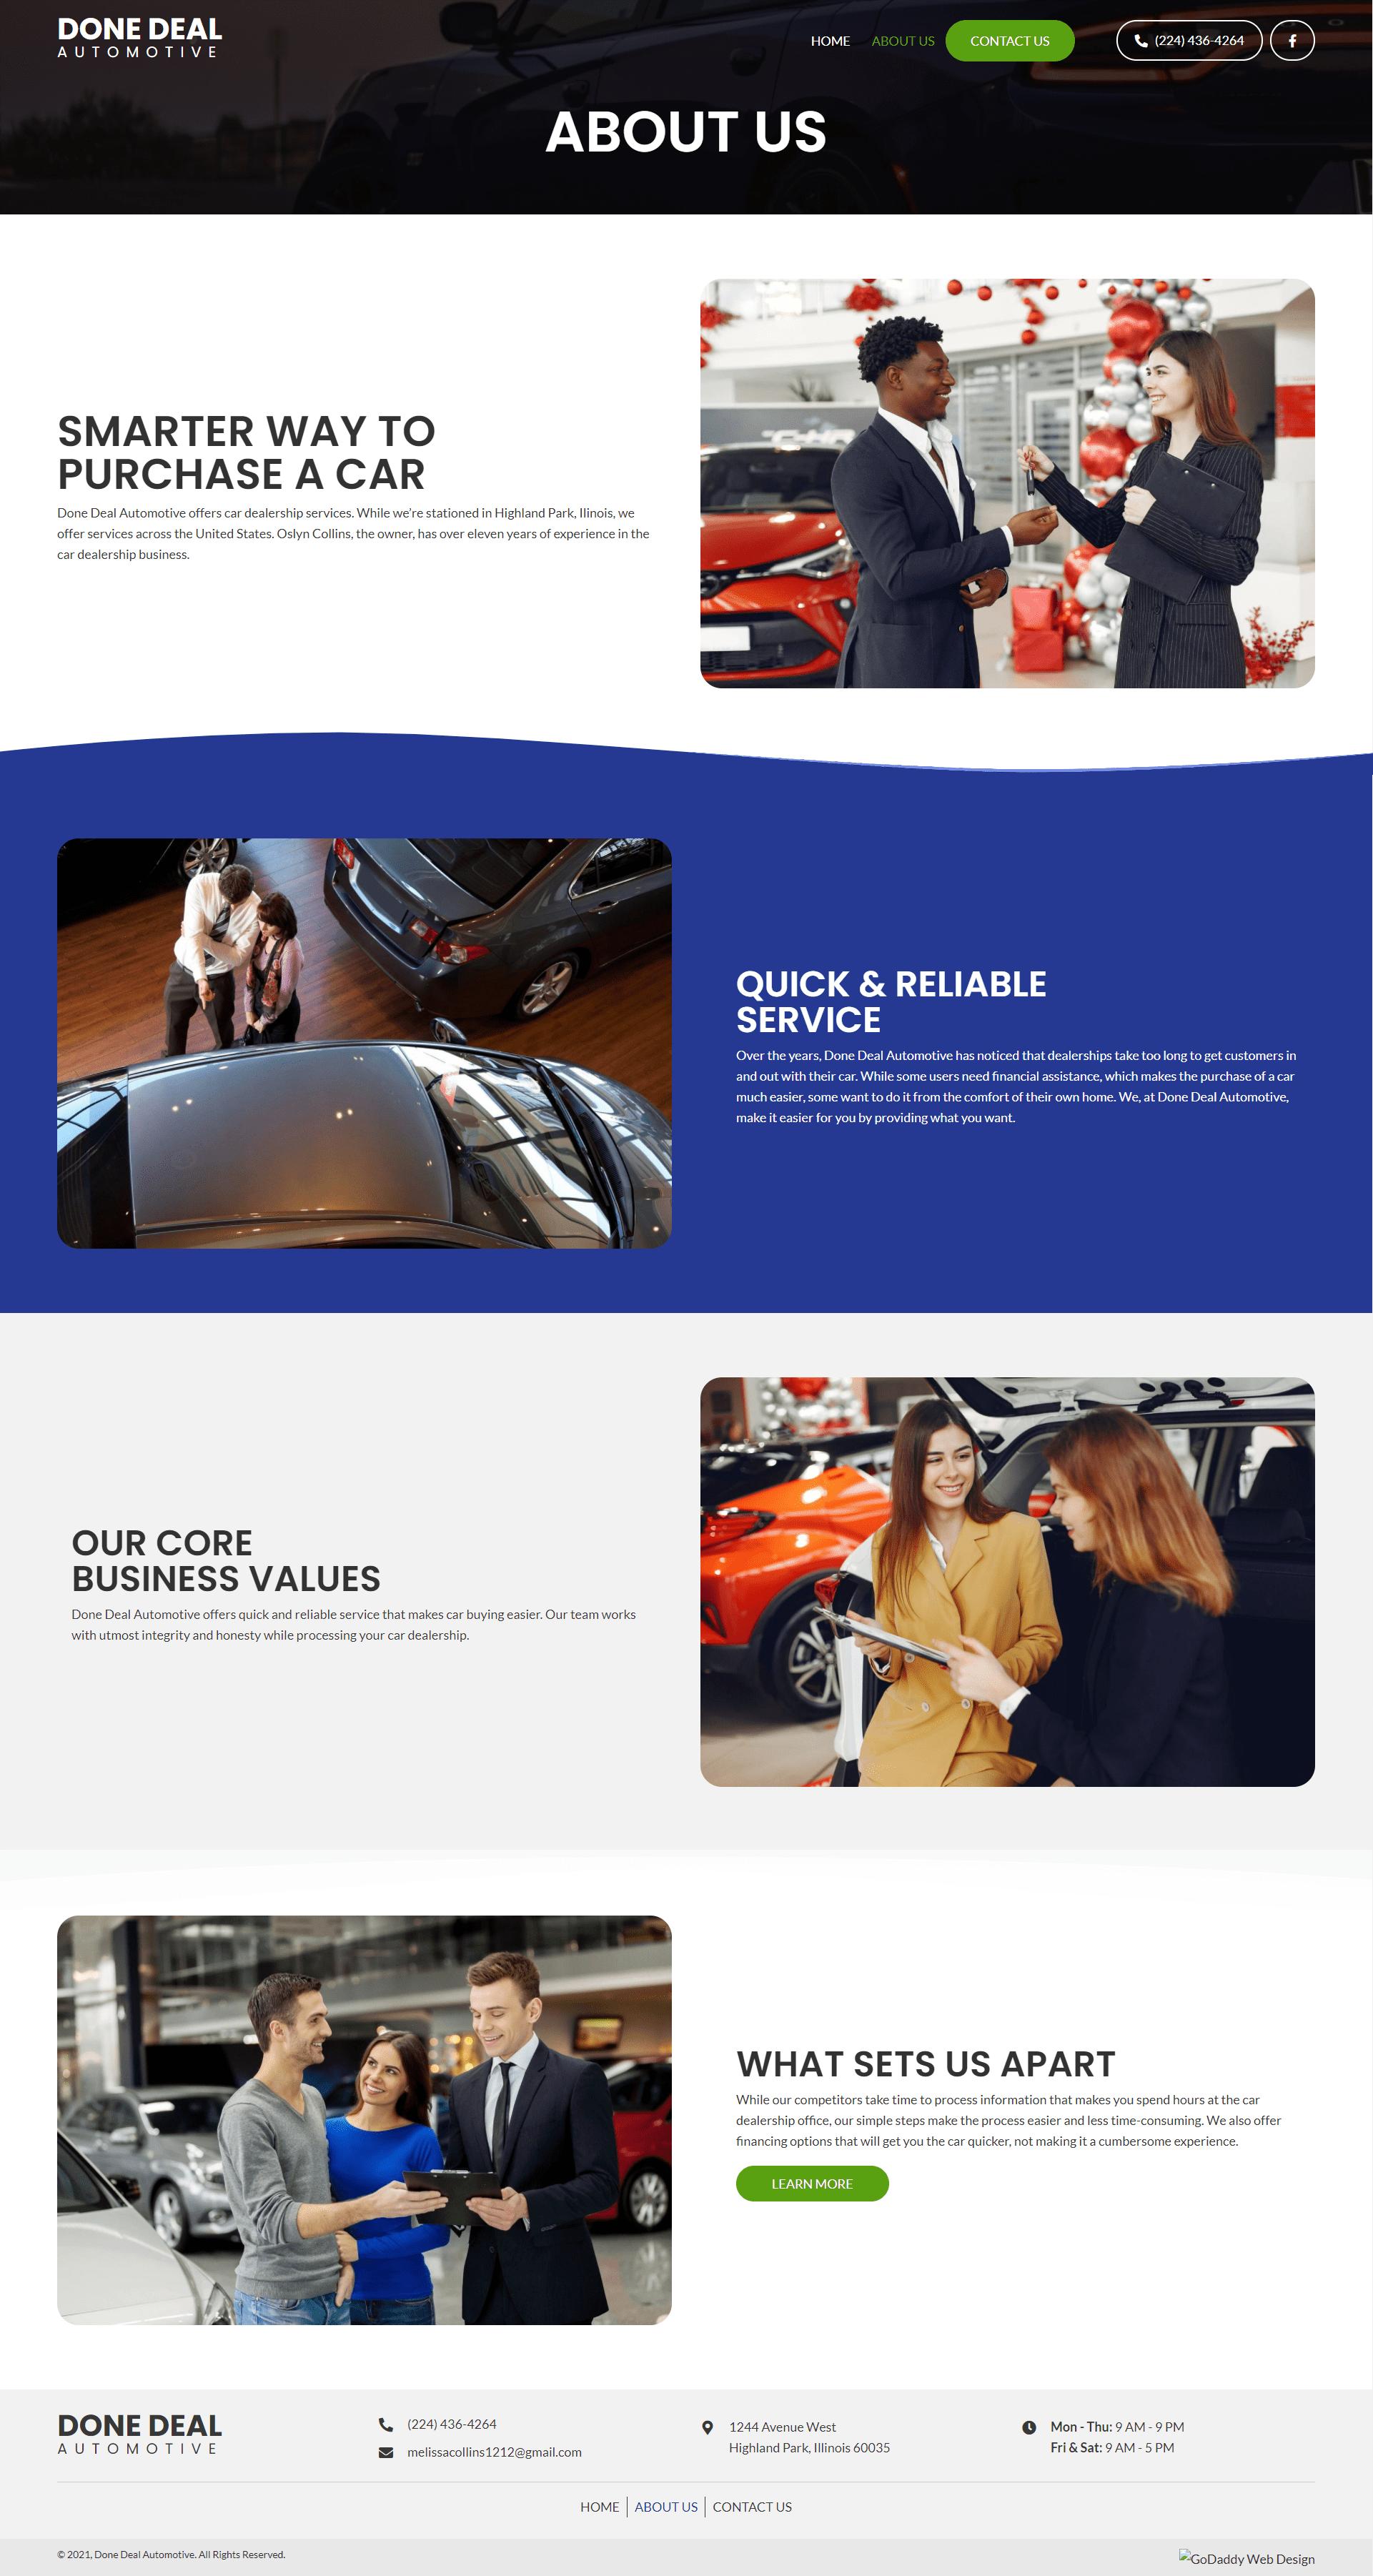 Done Deal Automotive About